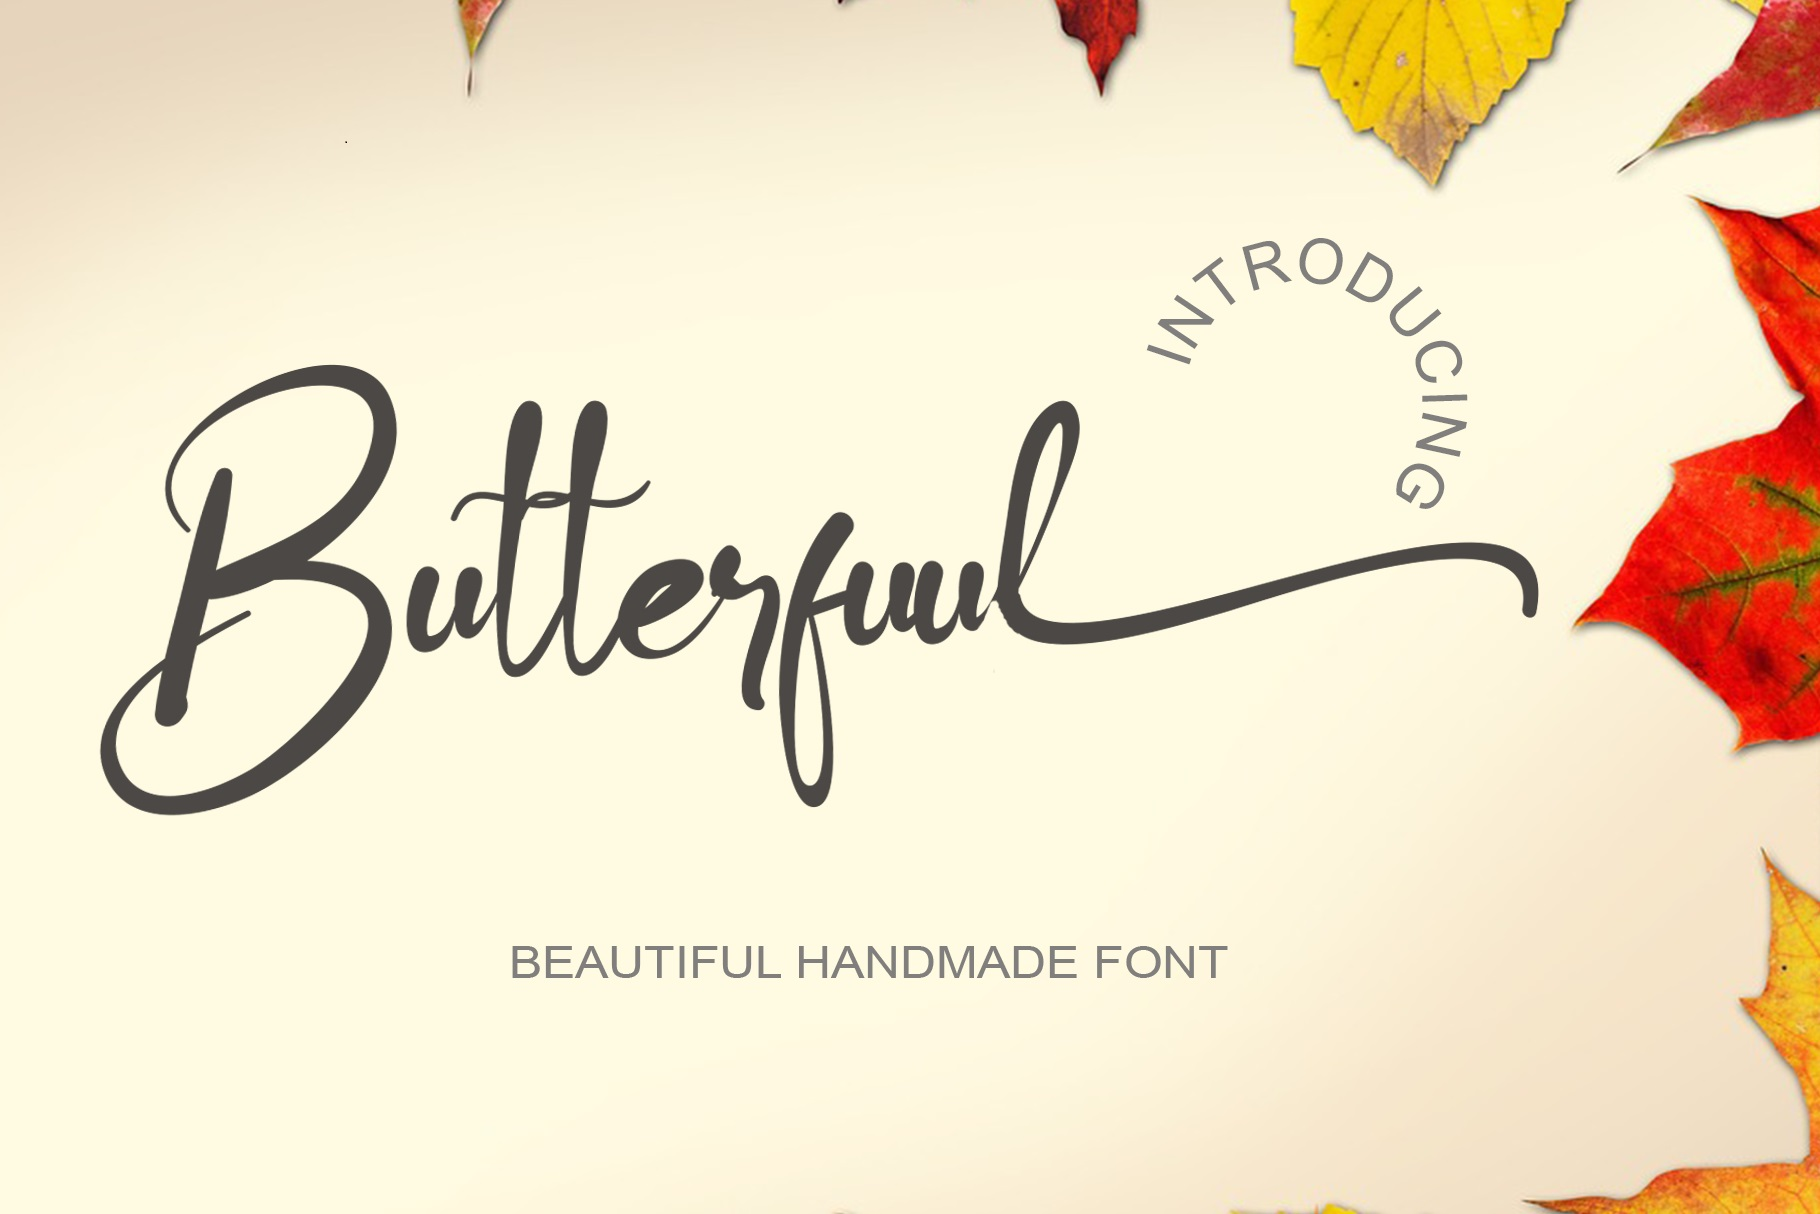 Butterfuul Calligraphy Script Font -1